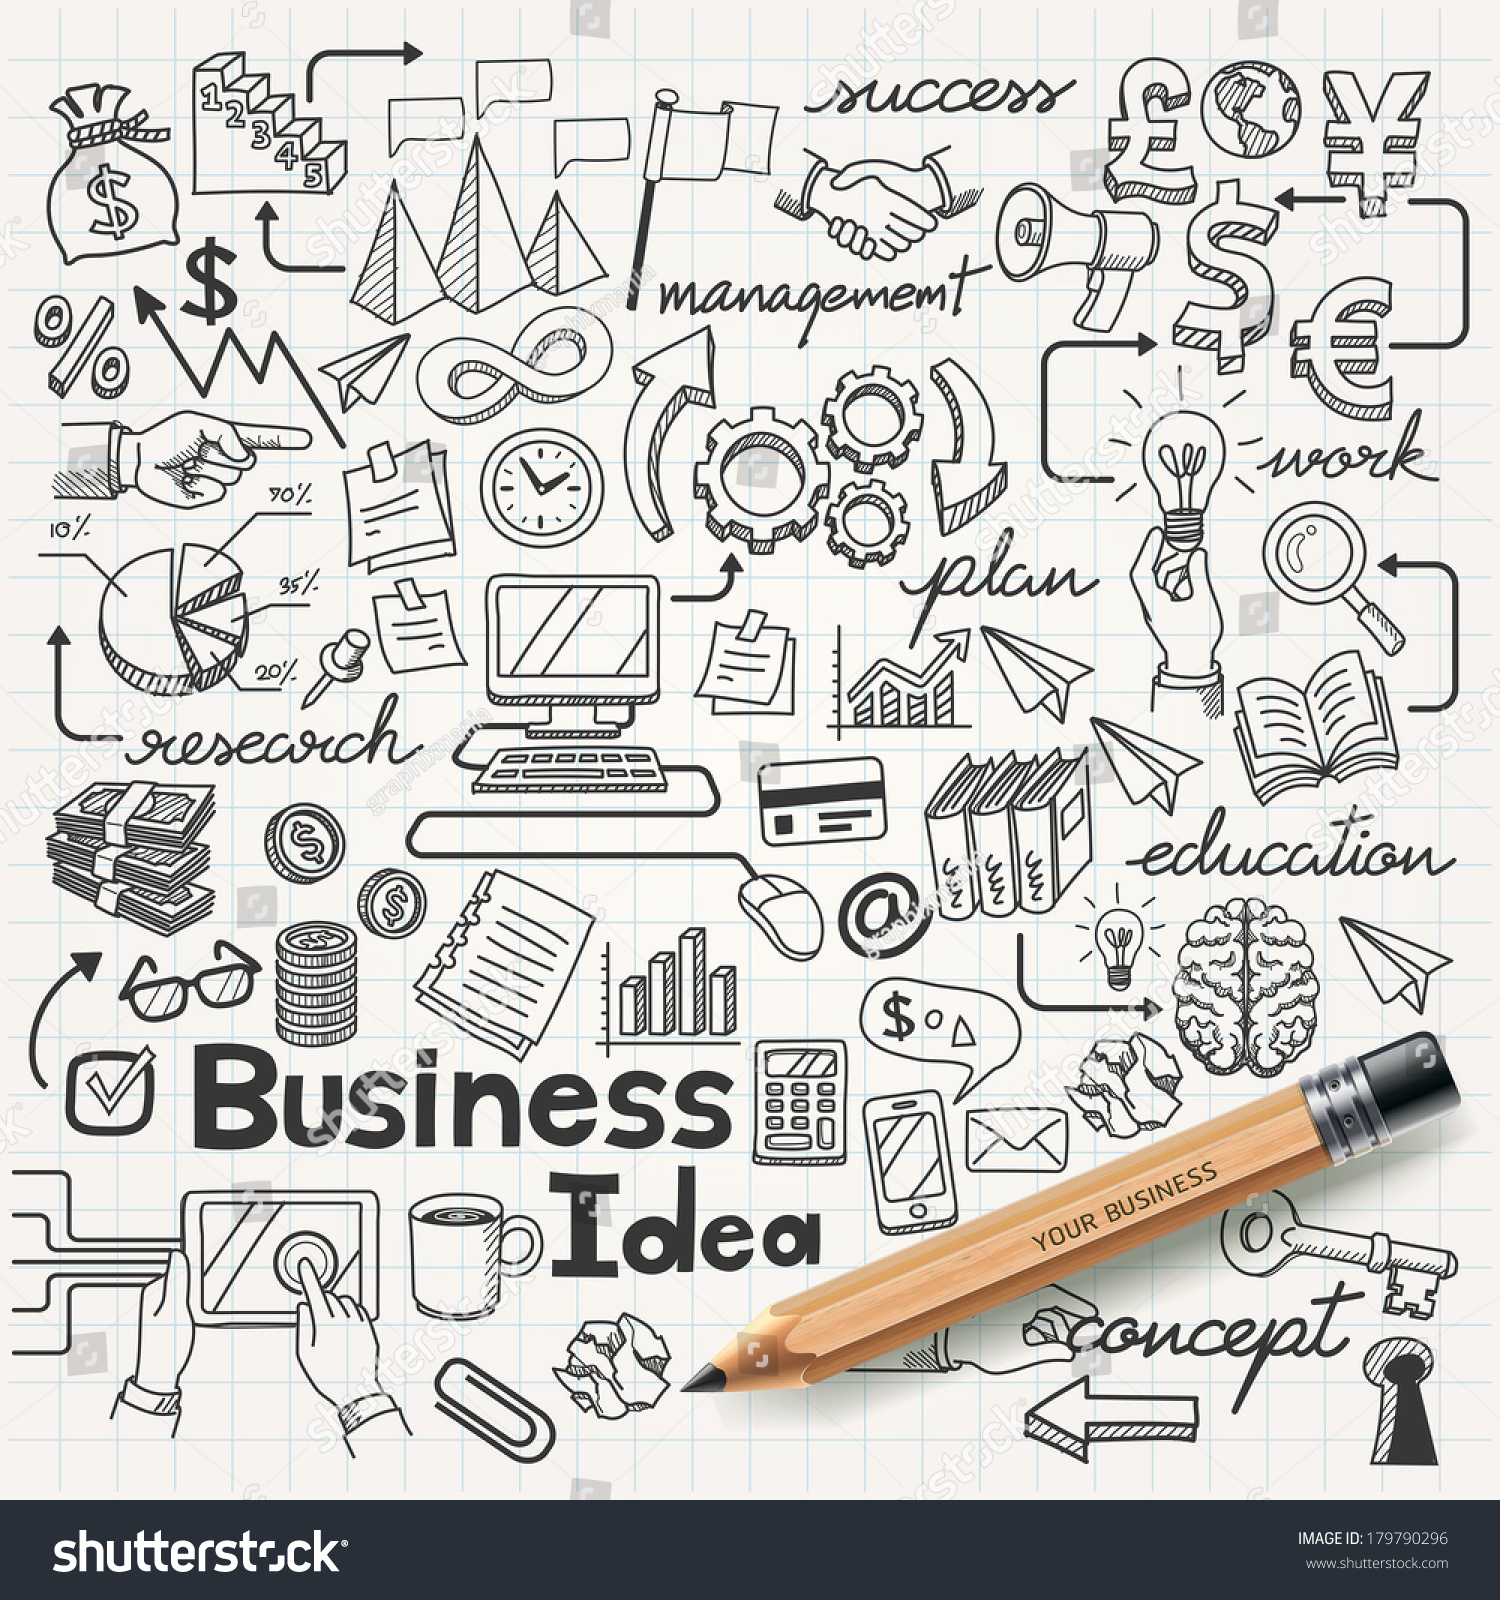 Business Idea doodles icons set. Vector illustration. #179790296